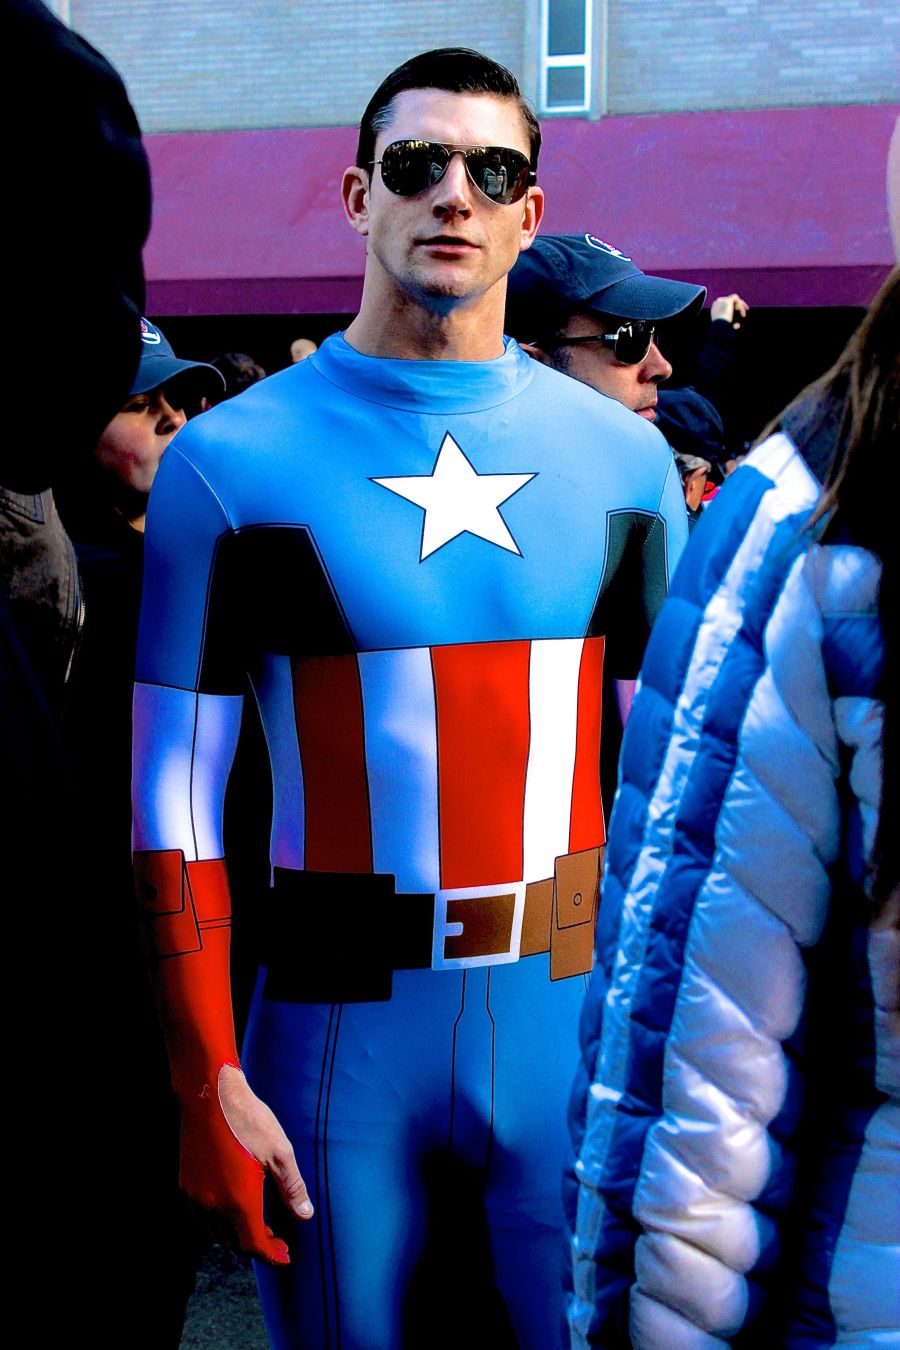 boston red sox world series celebration 2013 captain America 2